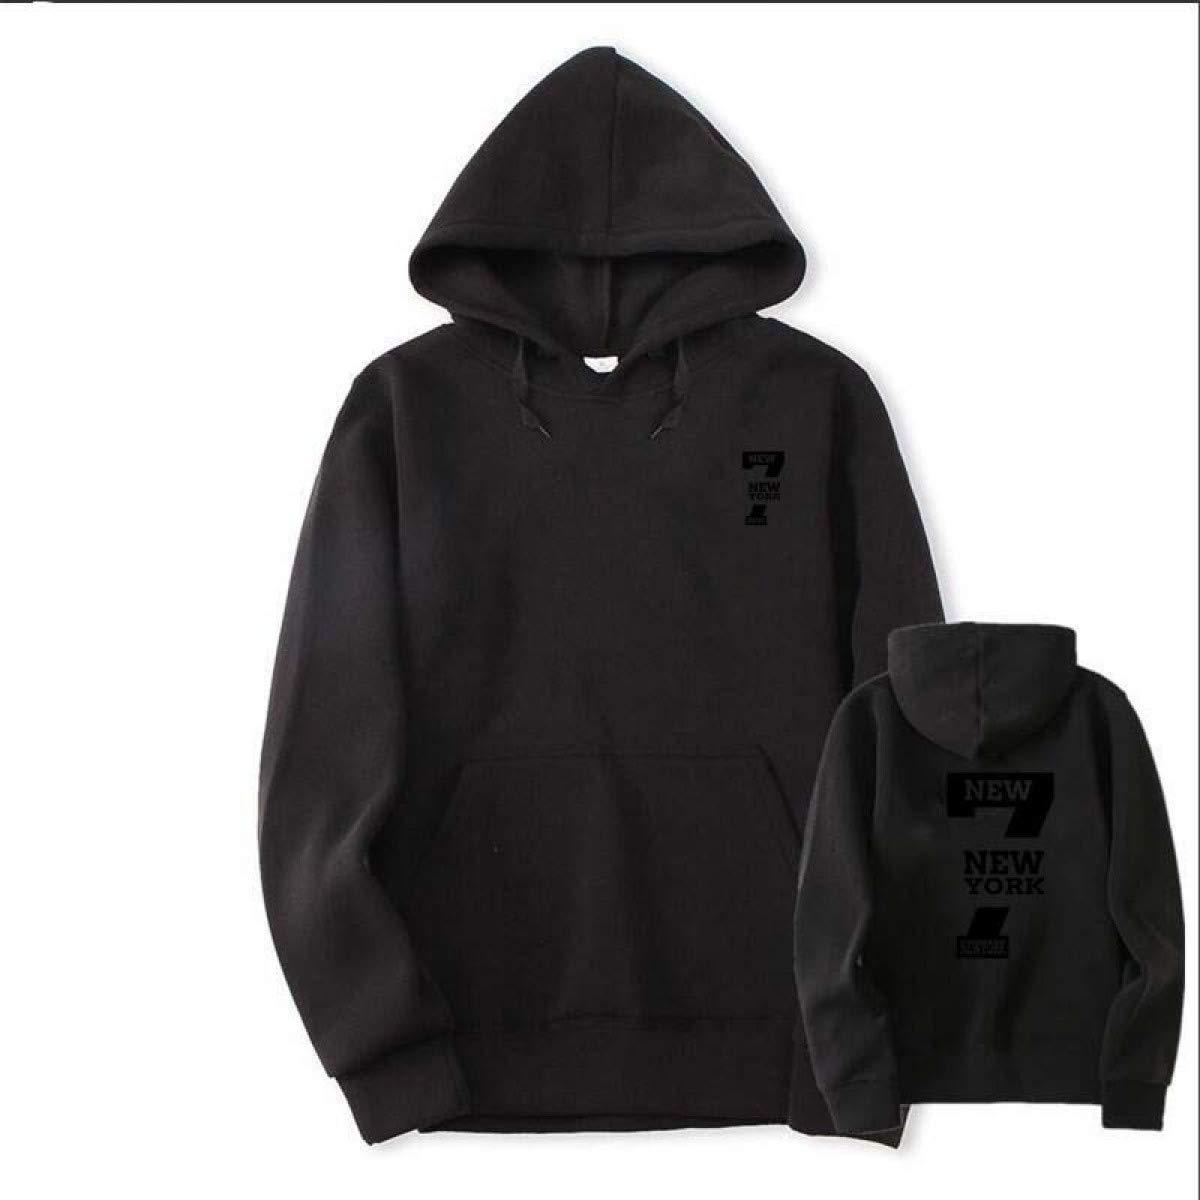 Amazon.com: WEEKEND SHOP Astroworld Hoodies for Men Astroworld Hoodie Streetwear Man Pullover Sweatshirt: Clothing